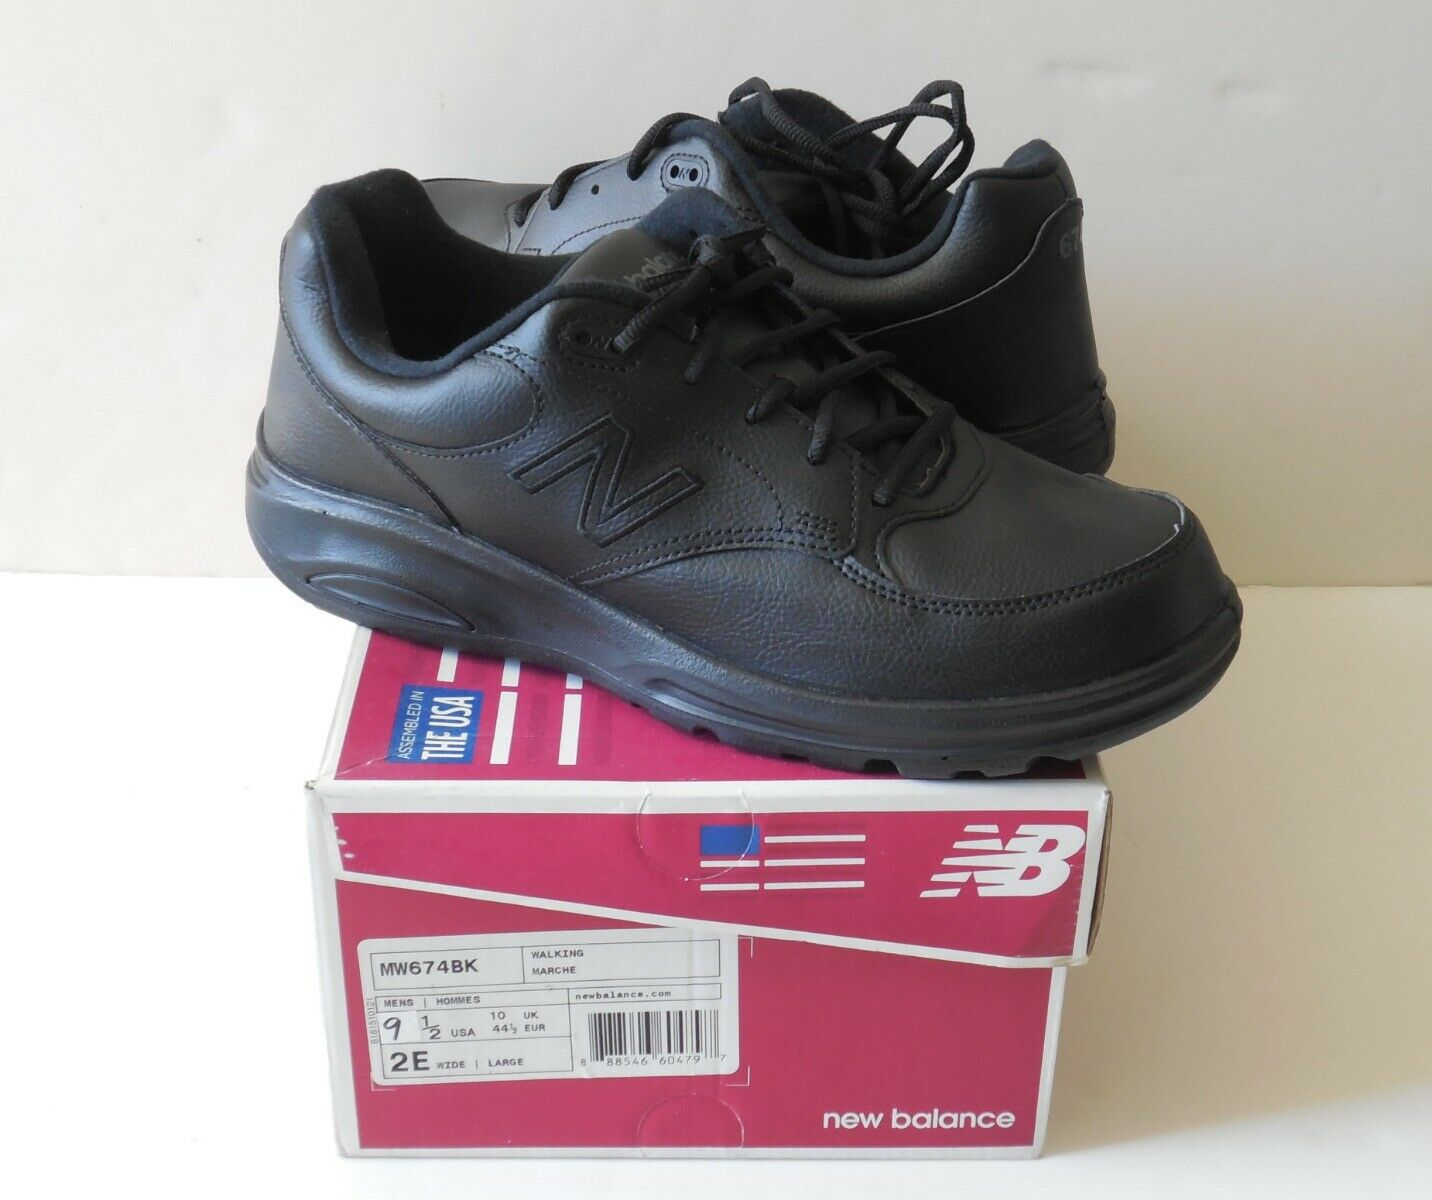 New Balance 674 Wandern MW674BK Herren Schuhe 9.5 2E Breit USA Neu